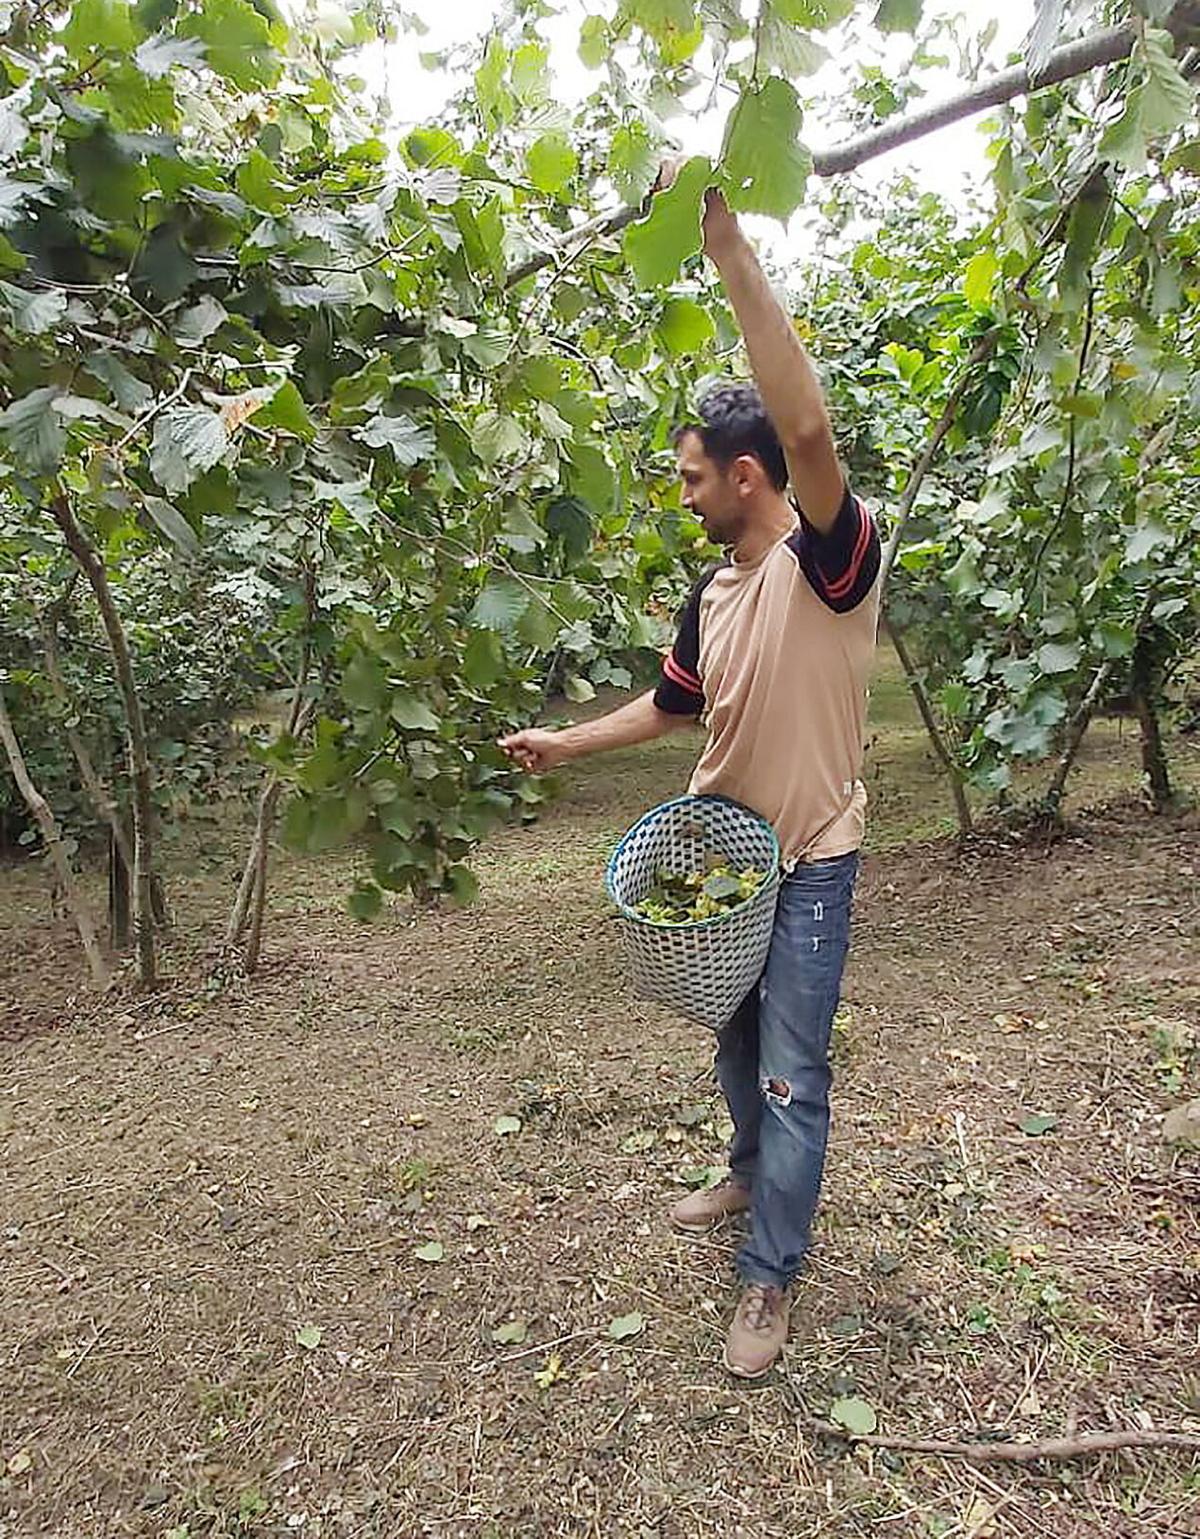 Picking hazelnuts